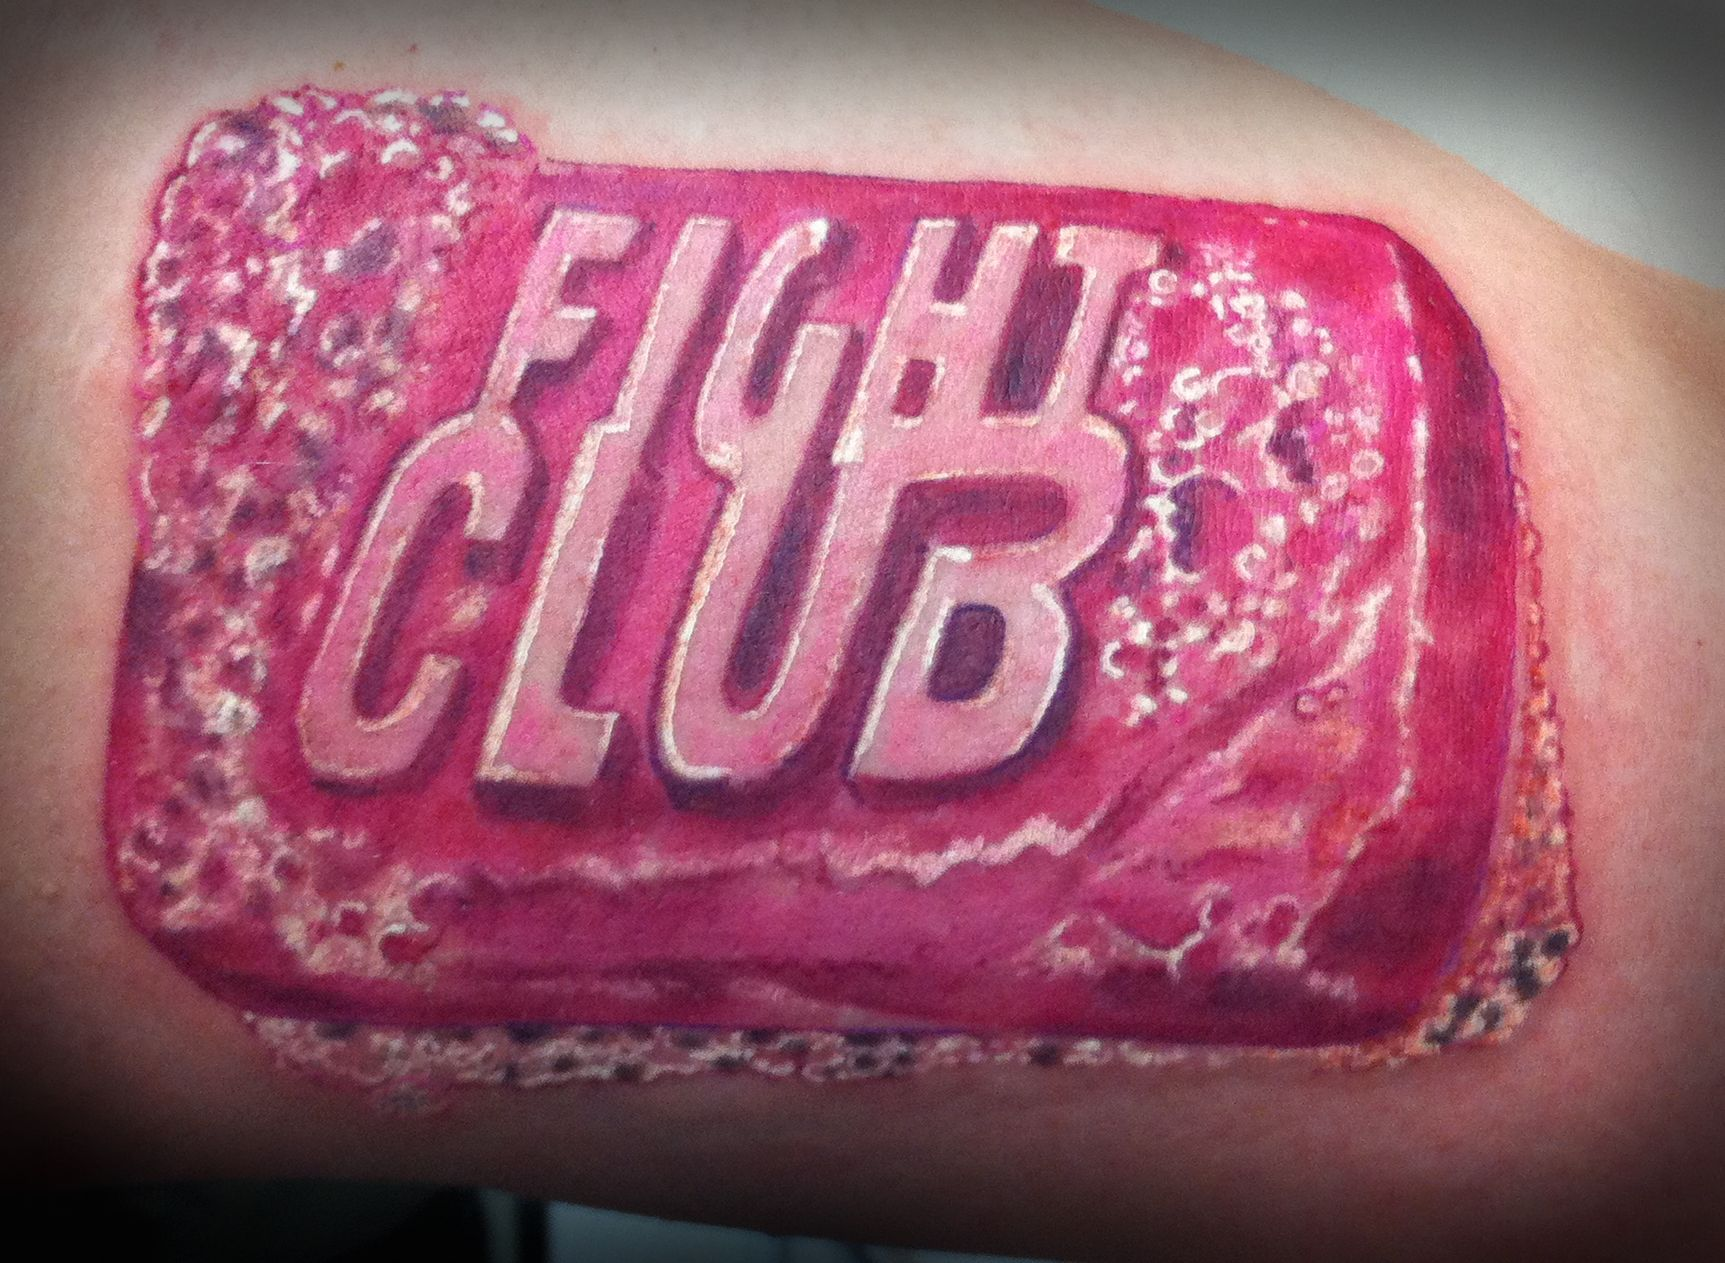 Da da danielle colby cushman tattoos - Fight Club Soap Tattoo Color